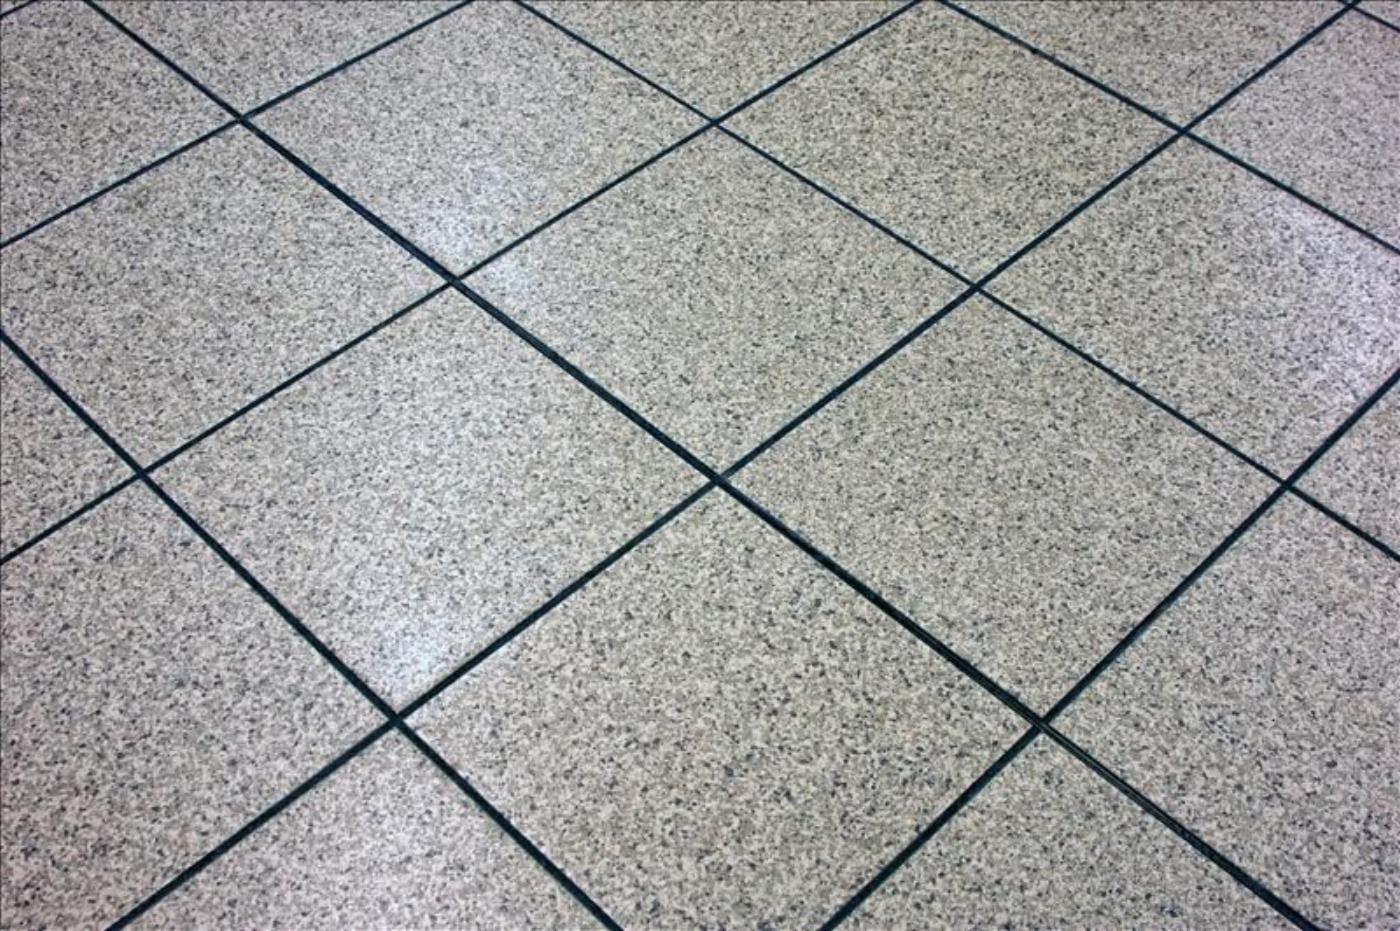 ozburn-hessey-make-rooms-look-larger-with-floors-nashville.jpg